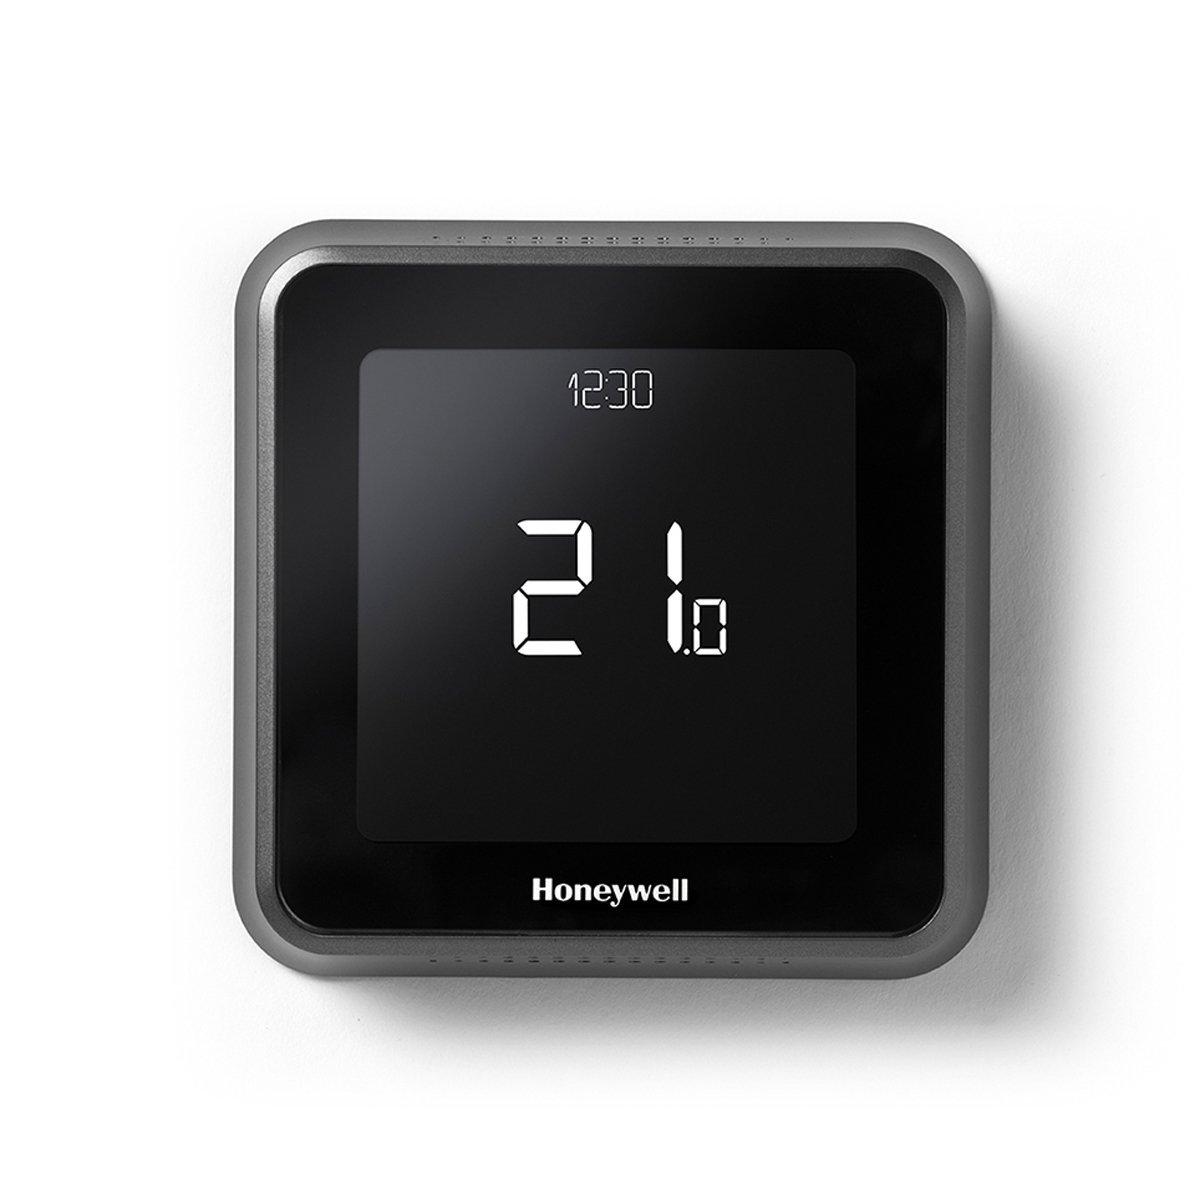 Honeywell lyric t6 cronotermostato wifi opinioni e for Honeywell cm31i prezzo